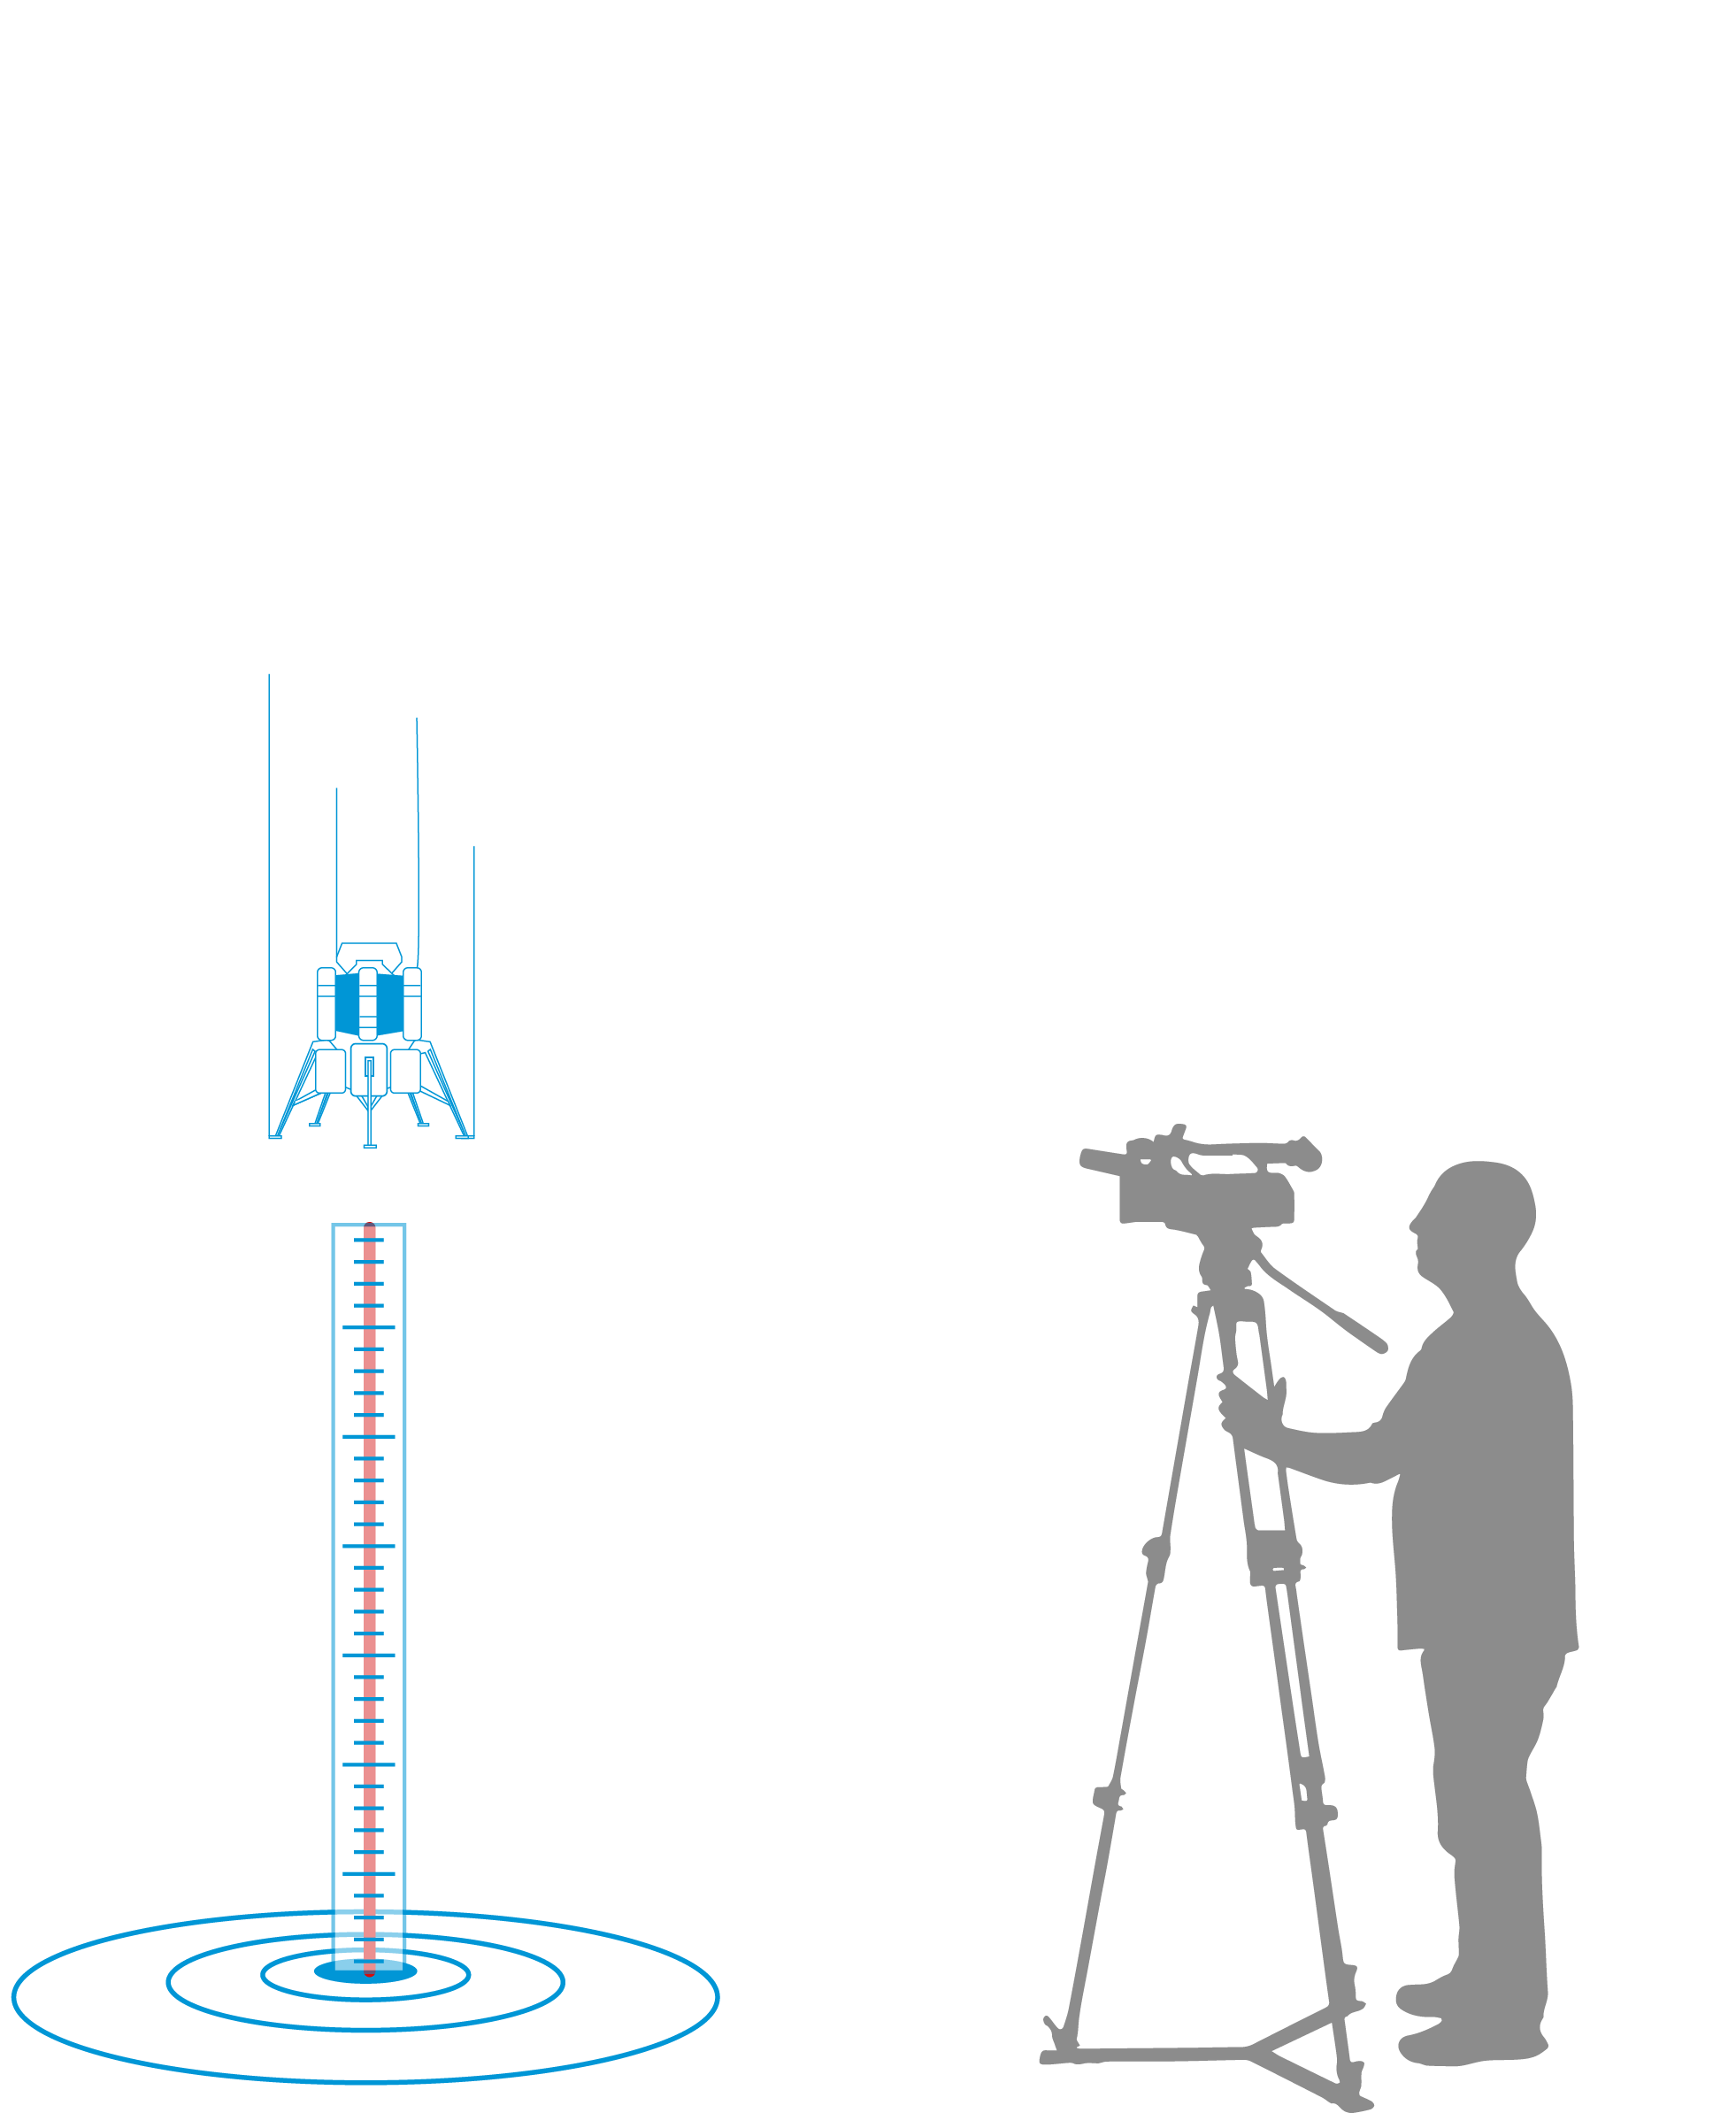 P37 Landing on the Moon – Planning and designing a lunar lander